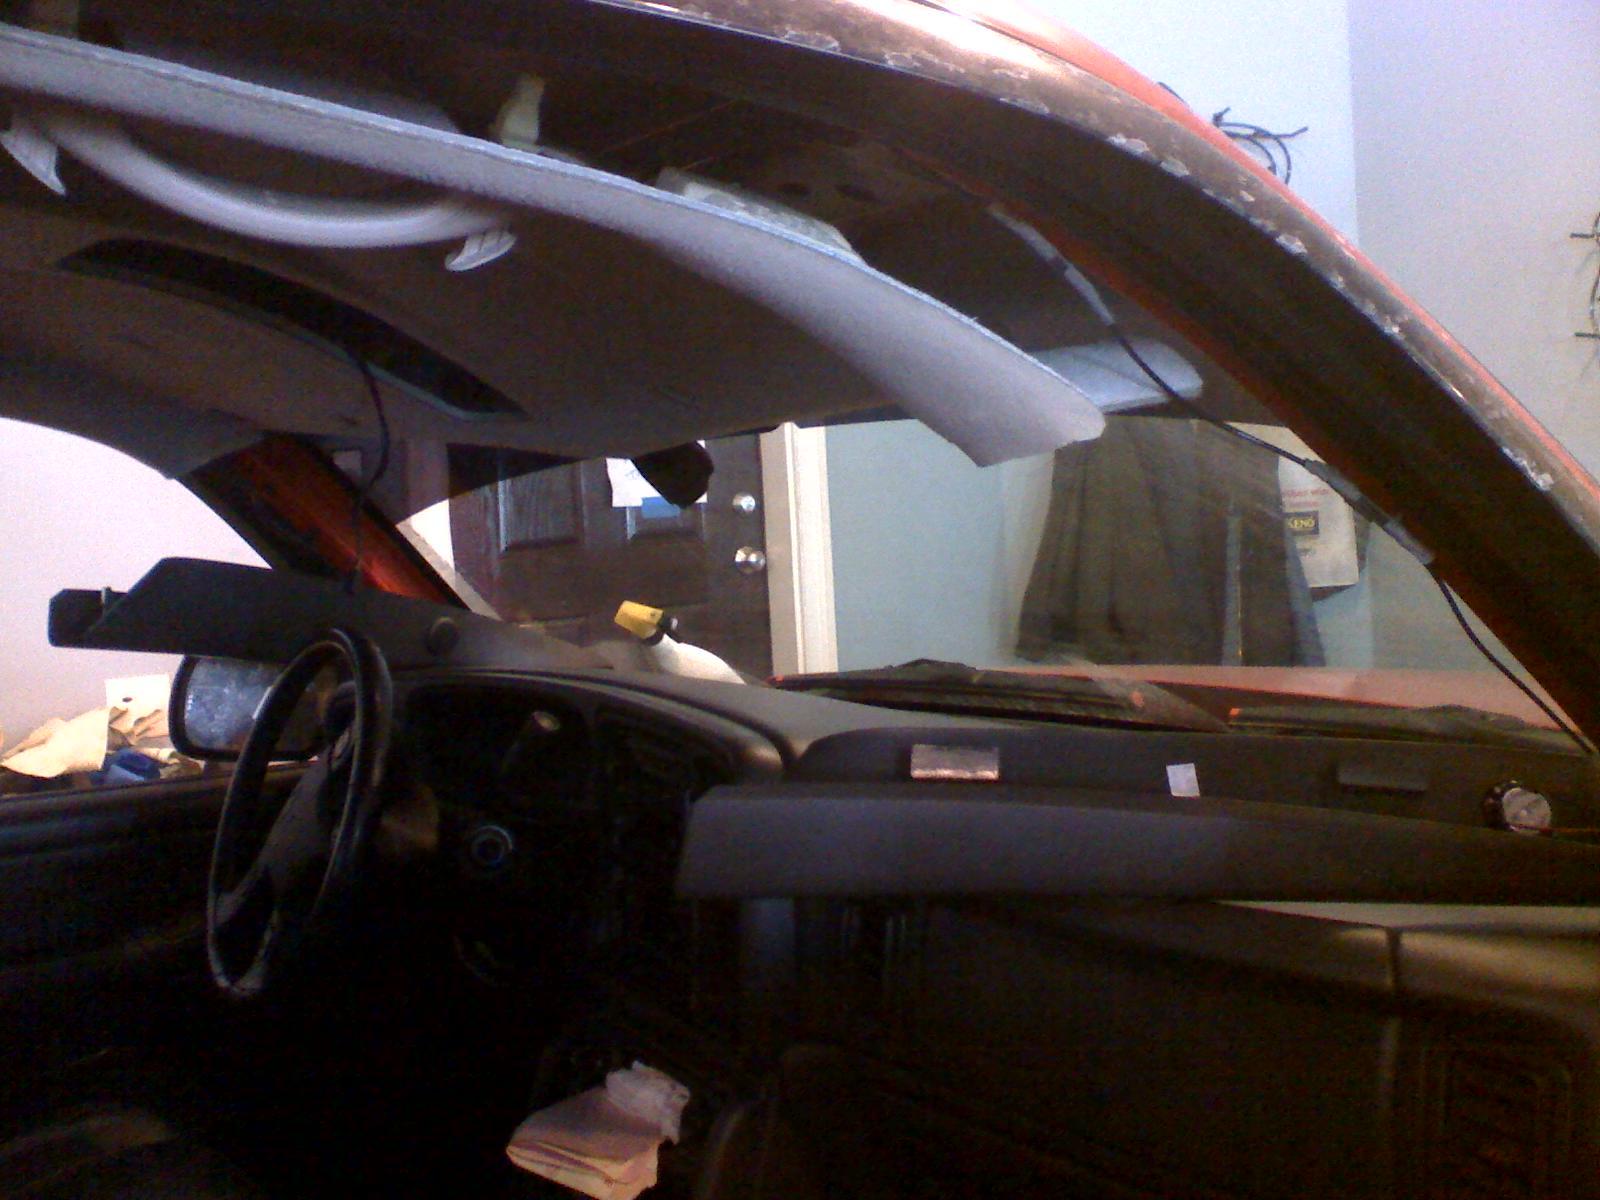 Chevy Roof Lights Cab For Silverado Mods How To Install 1600x1200